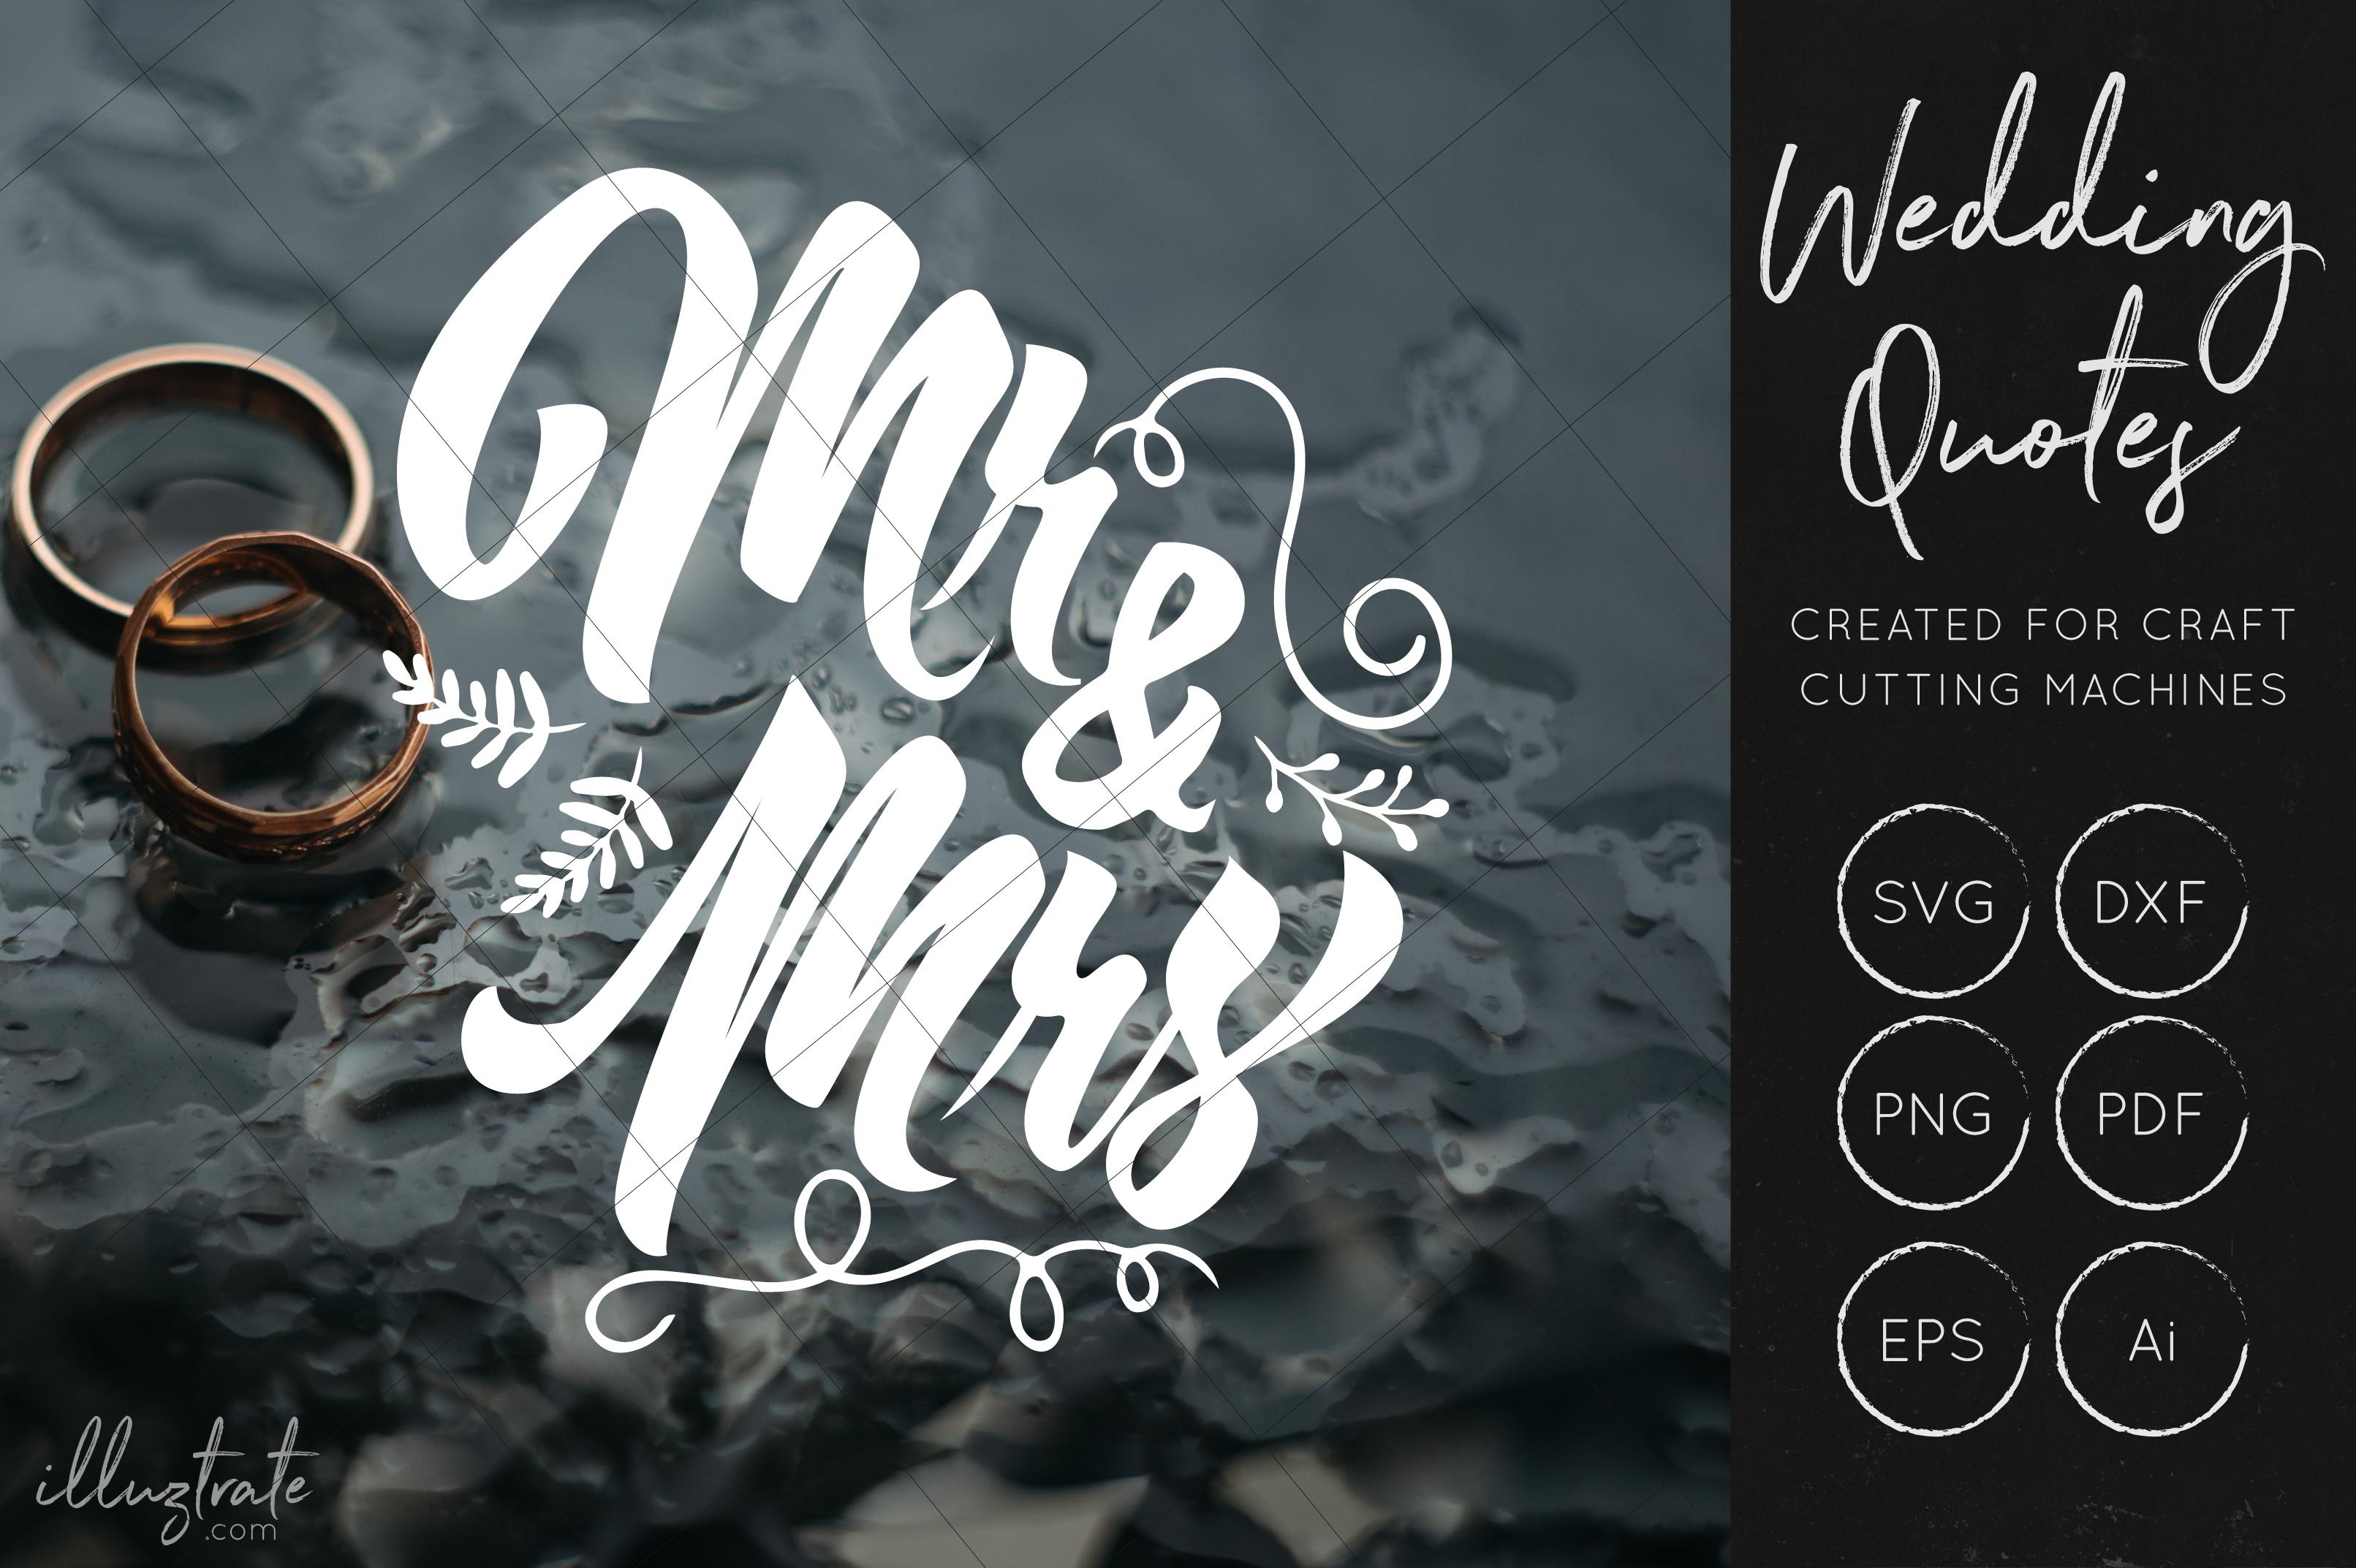 Wedding SVG Cut Files Bundle - Wedding Quotes - Wedding SVG example image 11